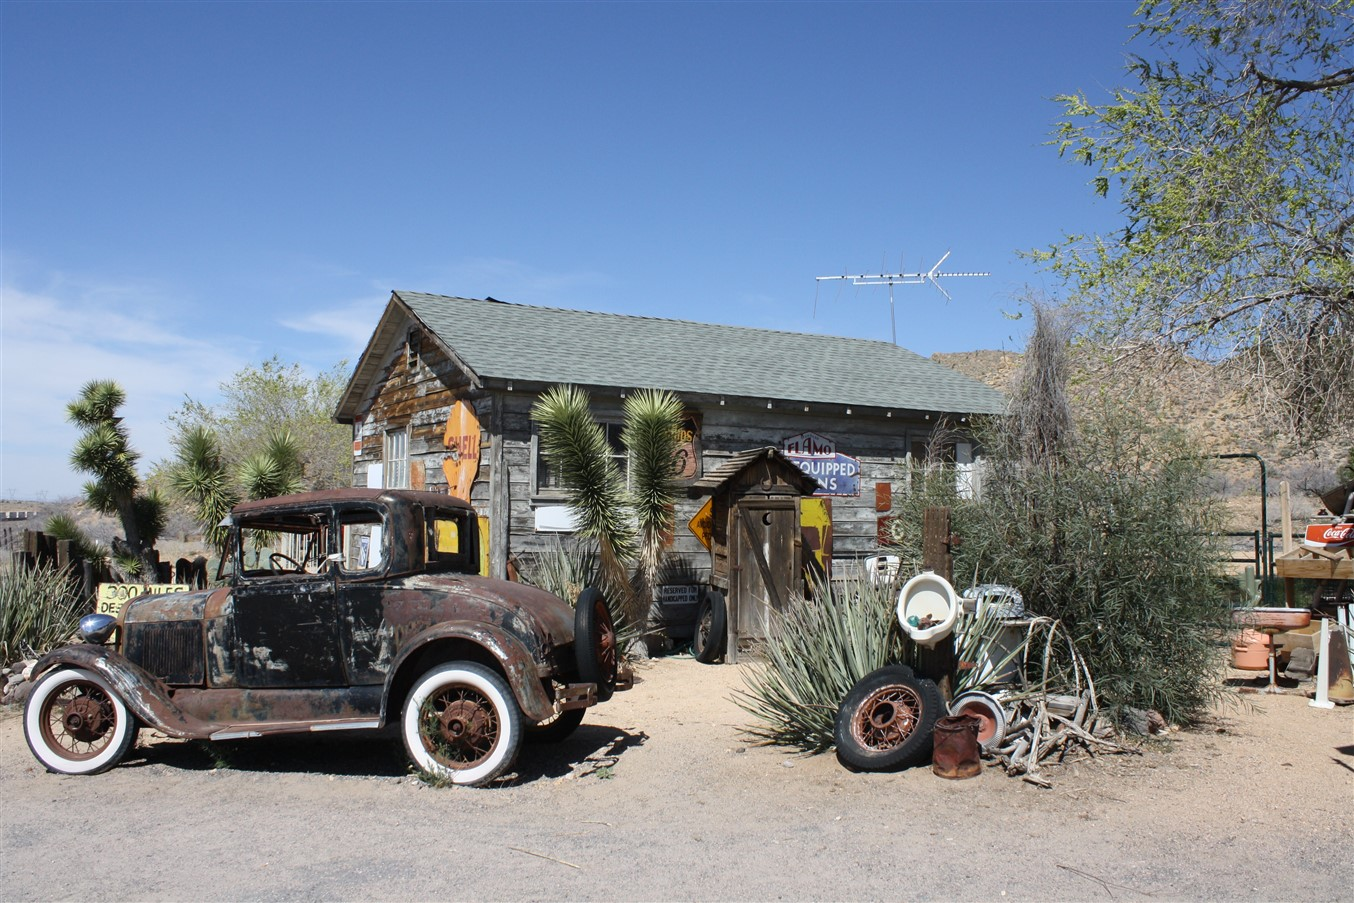 2012 03 14 Route 66 Road Trip 149 Hackberry Arizona.jpg